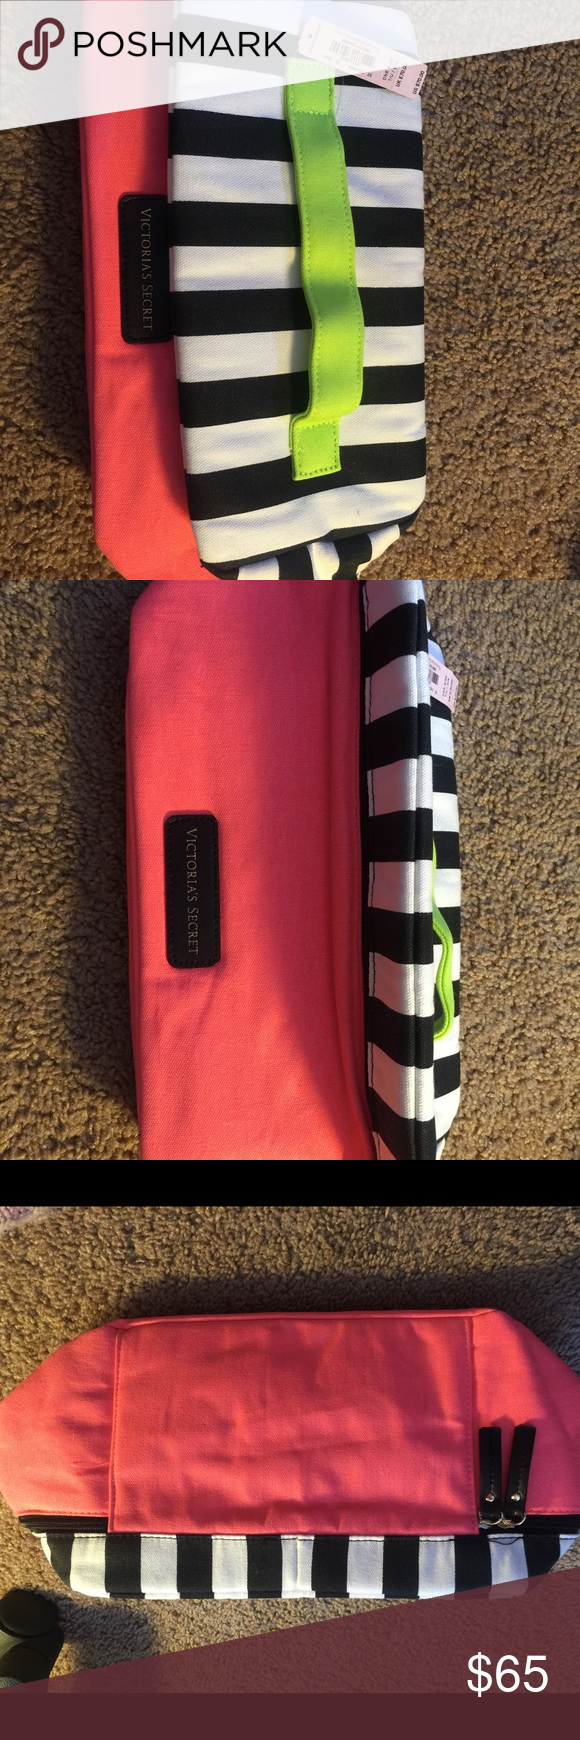 Victoria's Secret Lingerie bag Never used, no flaws Victoria's Secret Bags Cosmetic Bags & Cases